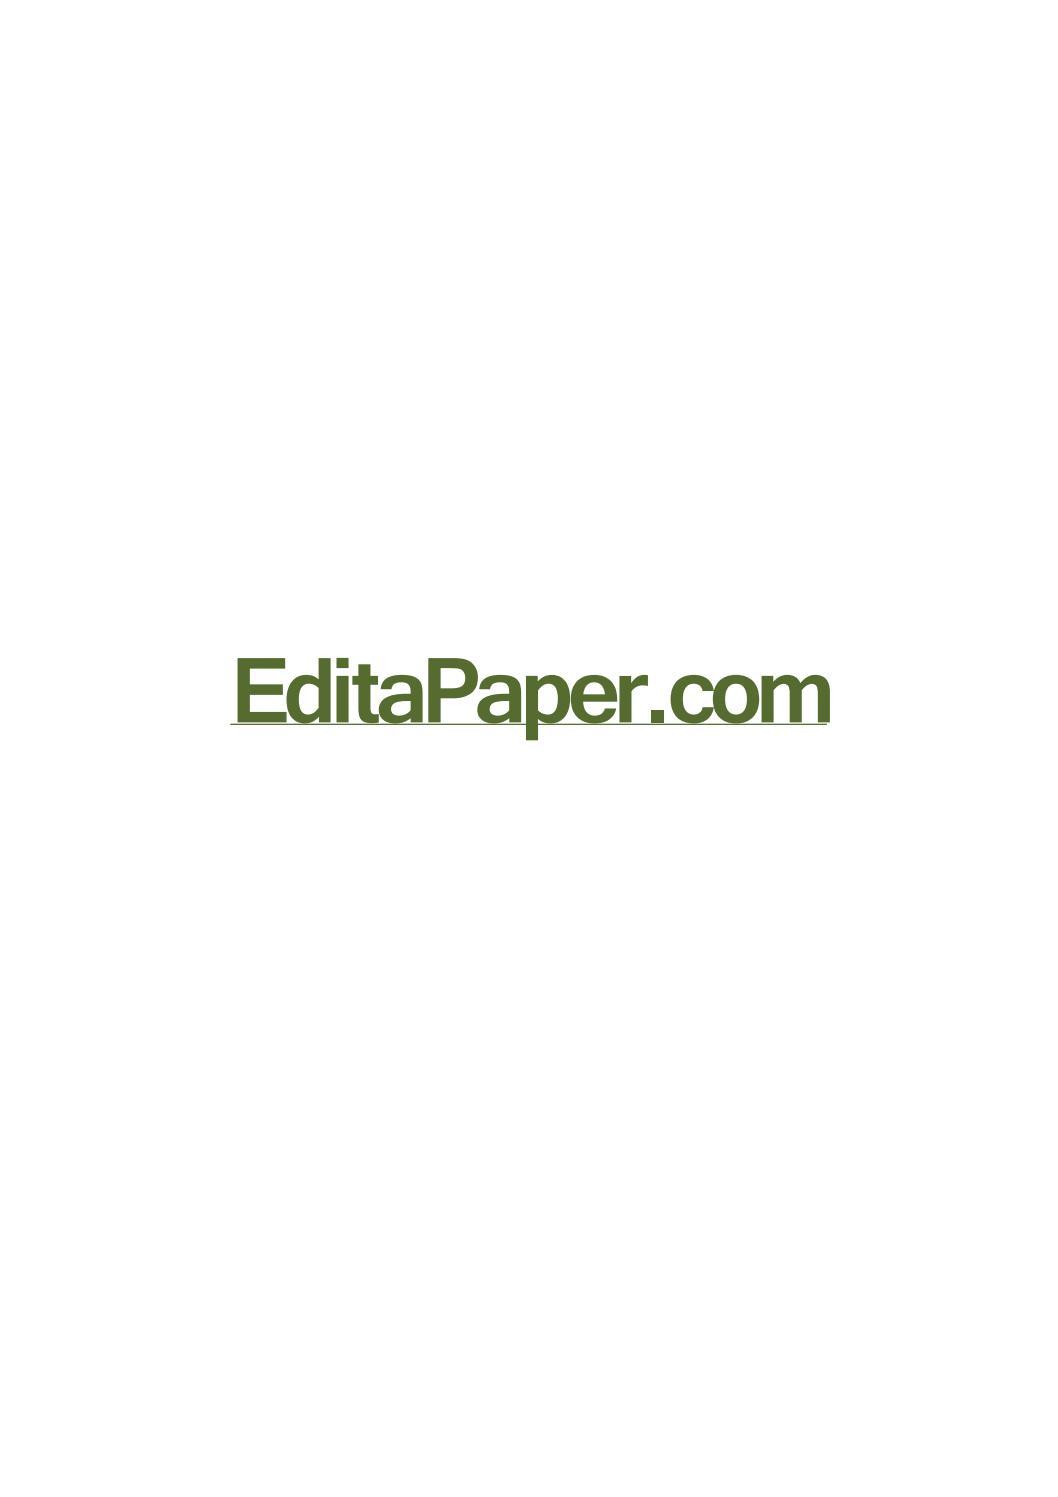 murder joana cipriano wikipedia